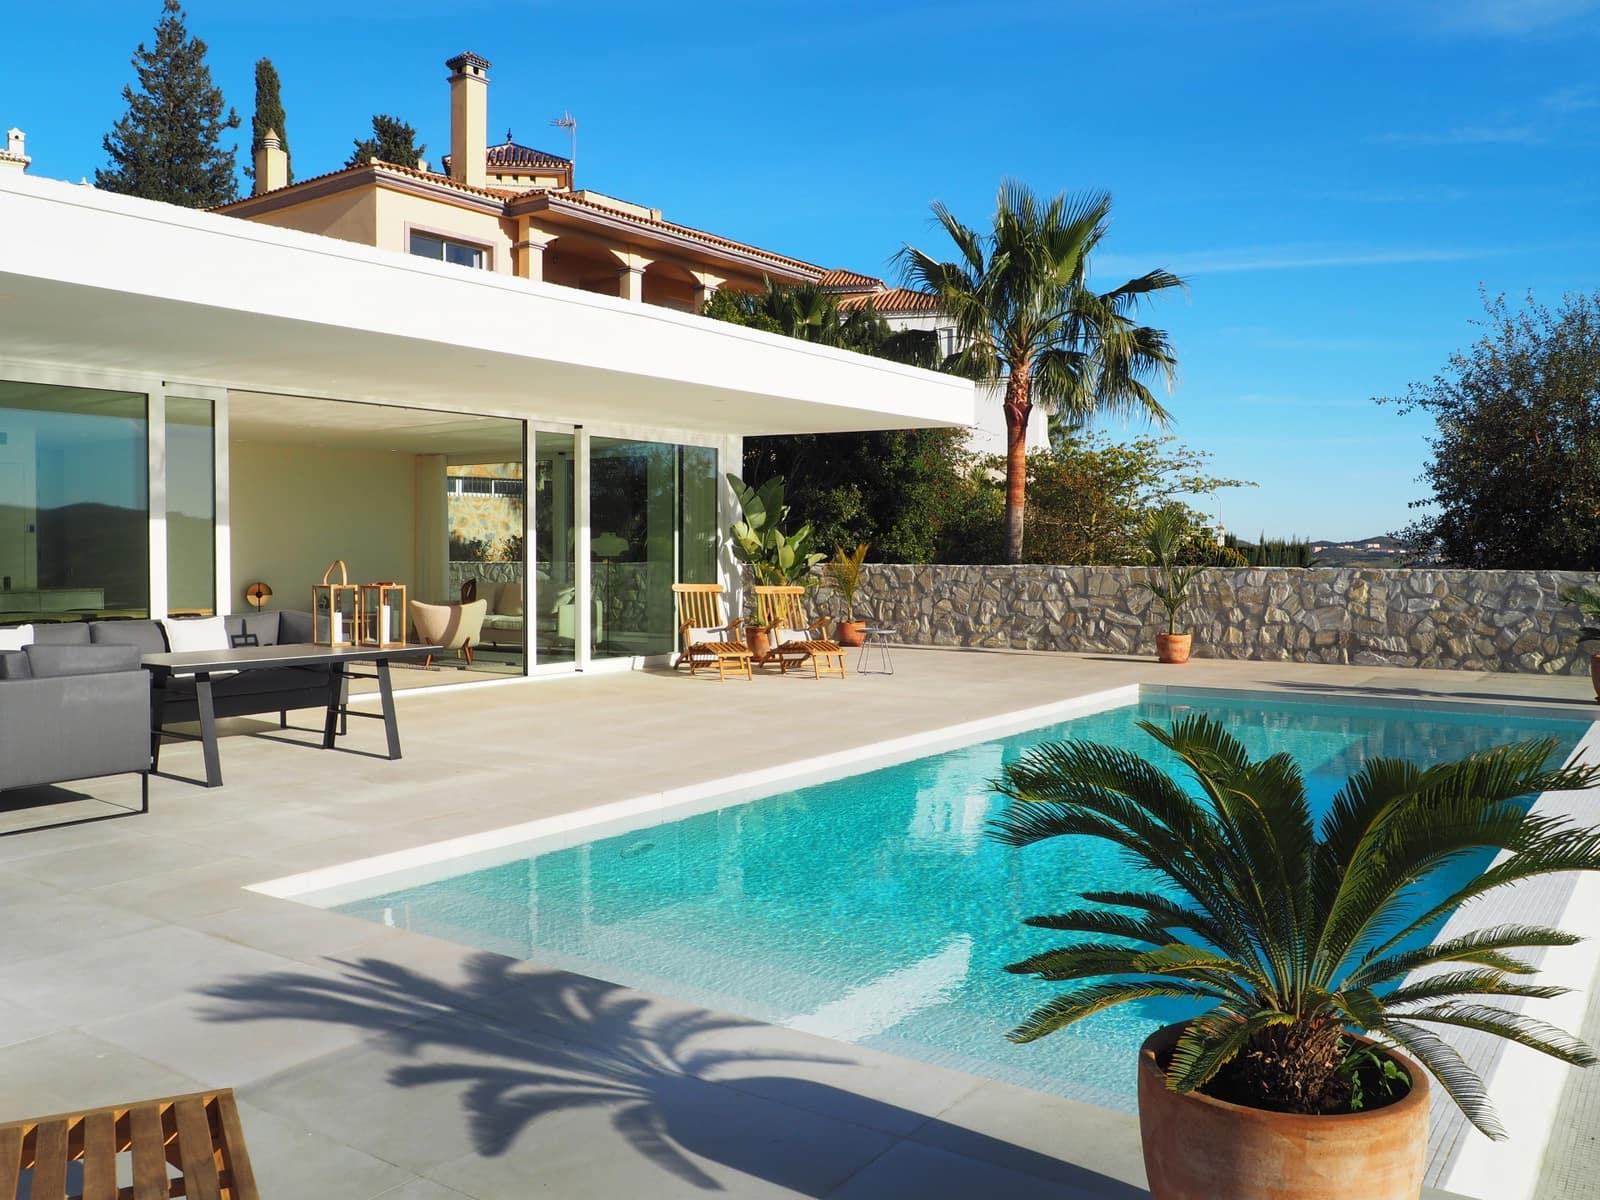 4 bedroom Villa for sale in Mijas Golf with pool garage - € 850,000 (Ref: 4511599)